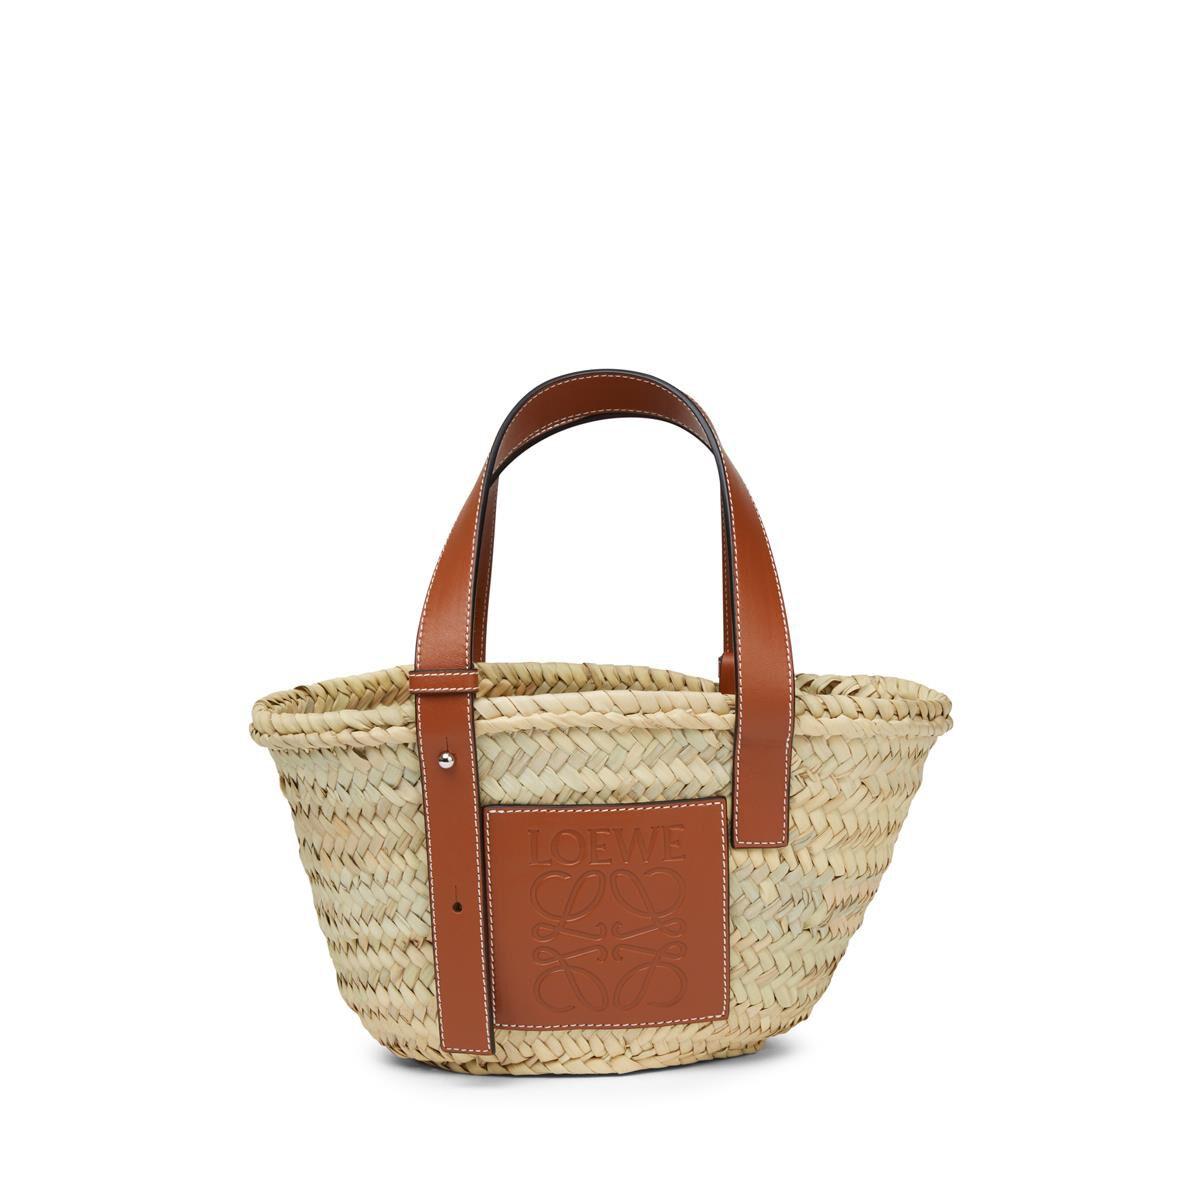 LOEWE Basket Small Bag 原色/棕褐色 all